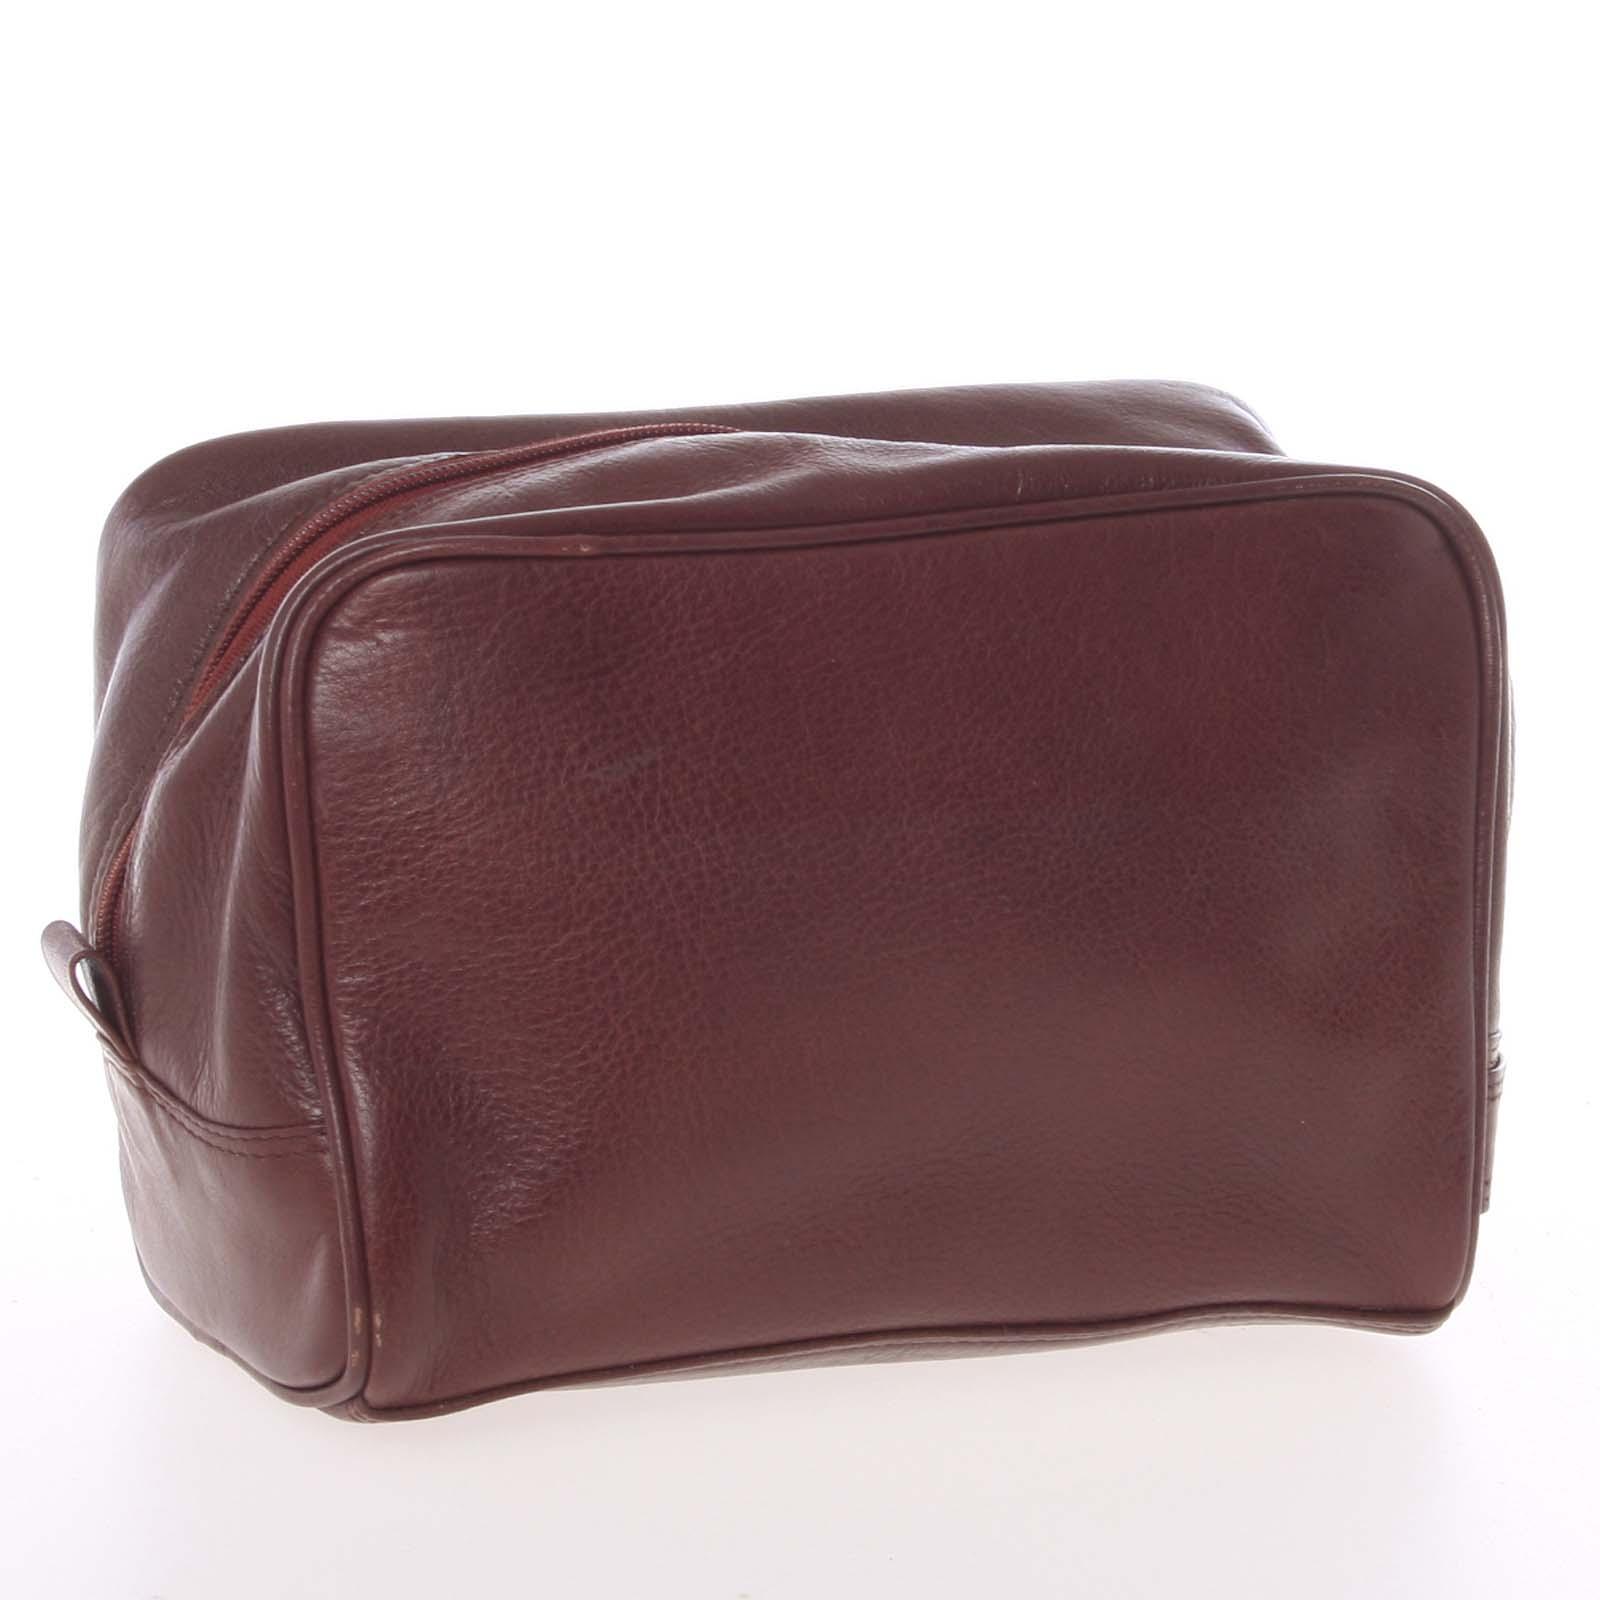 Pánská hnědá kožená kosmetická taška - E680